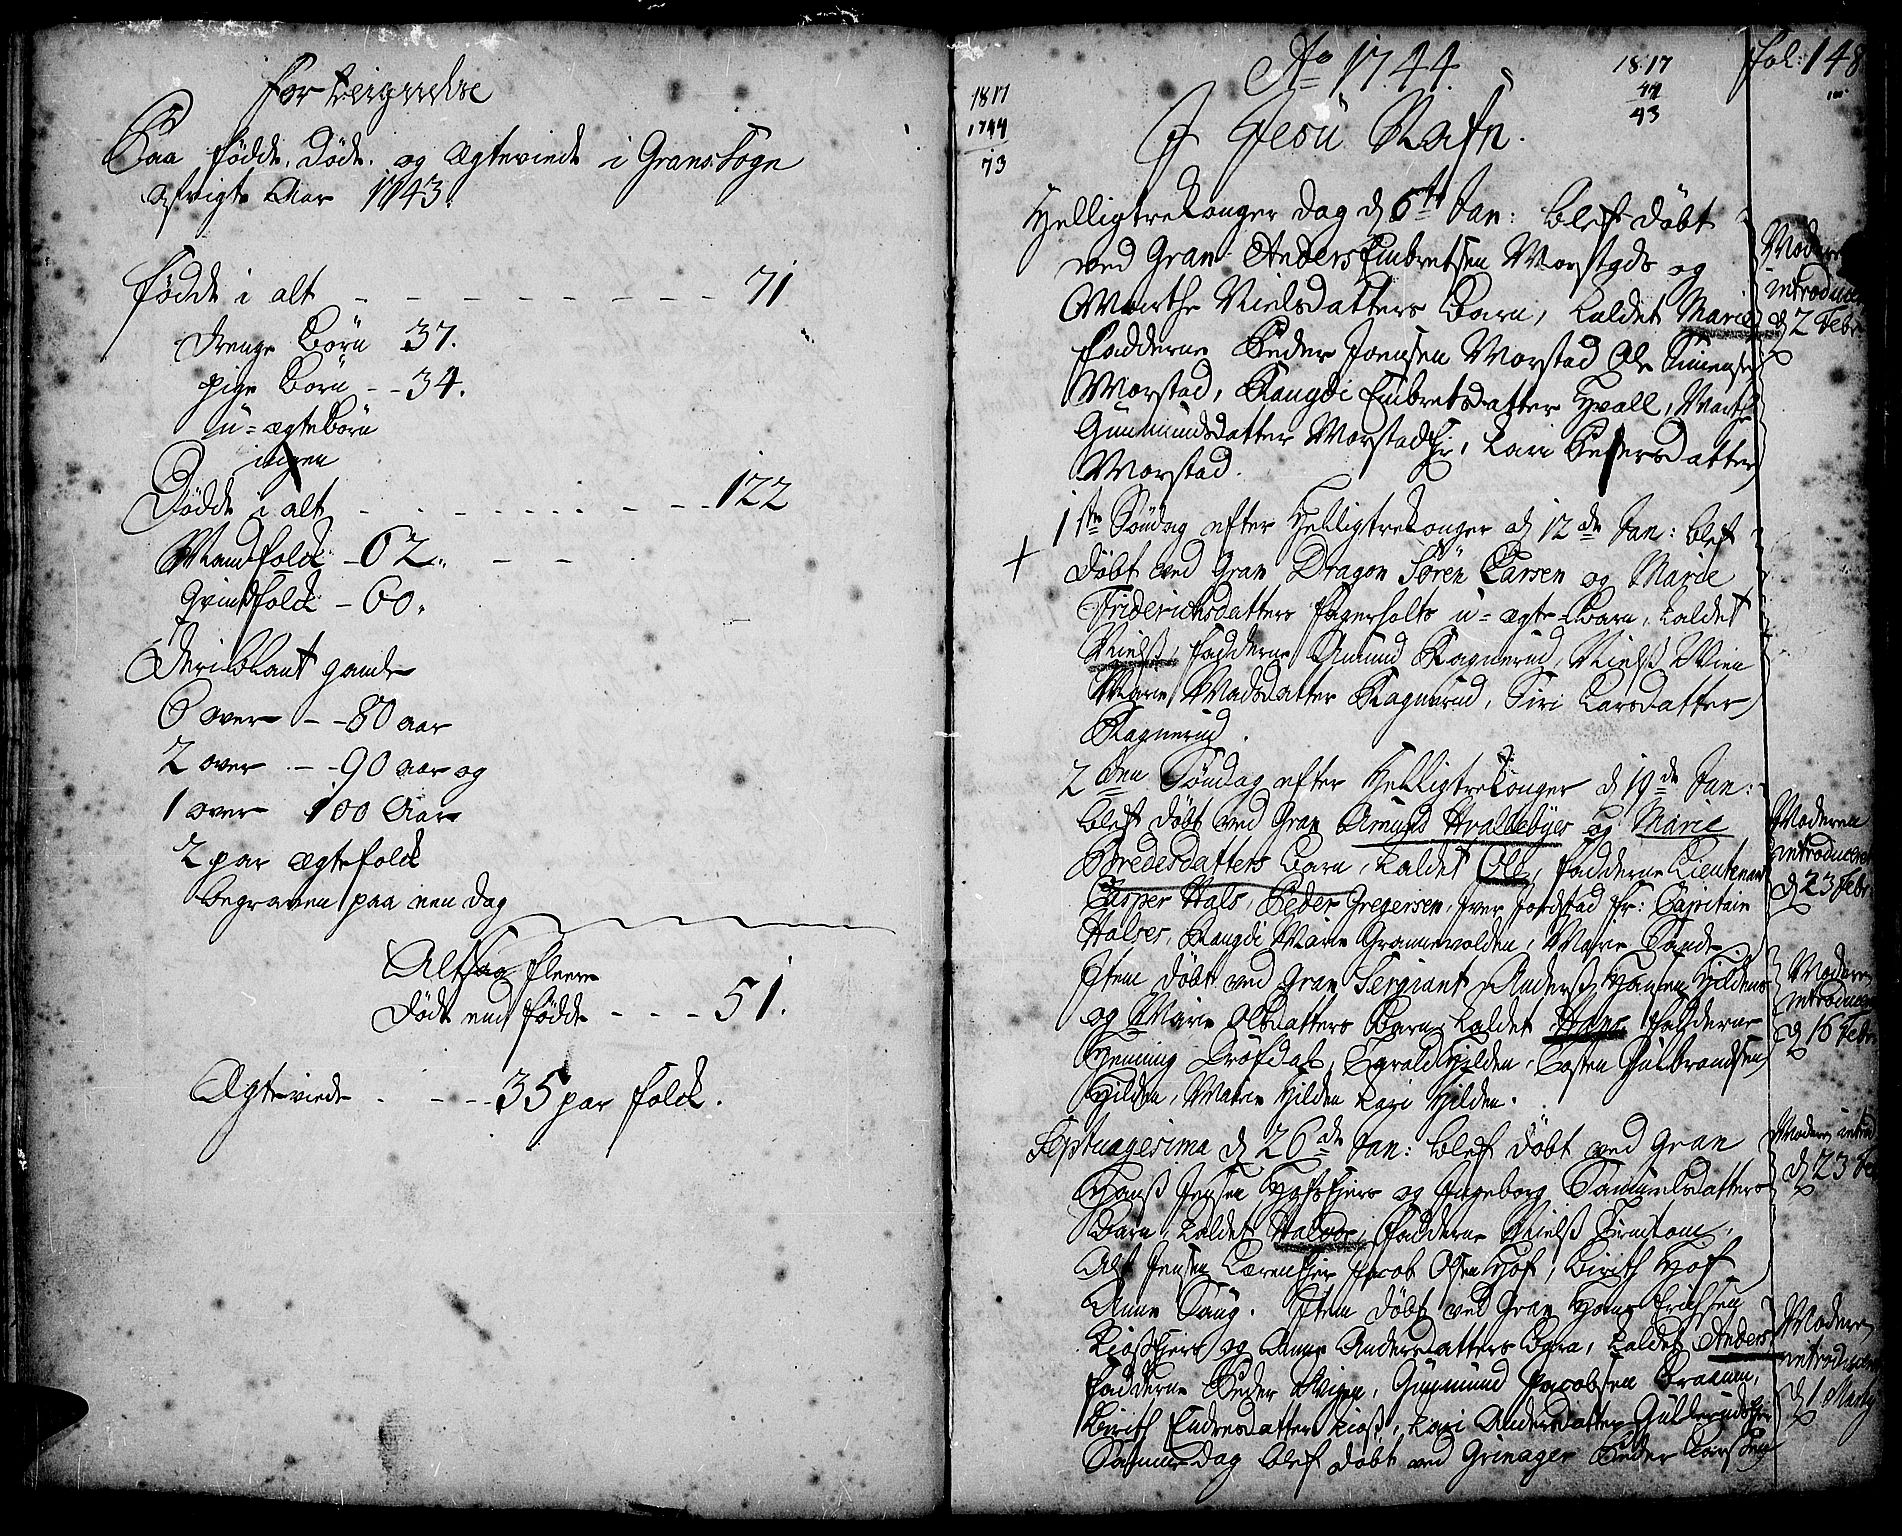 SAH, Gran prestekontor, Ministerialbok nr. 2, 1732-1744, s. 148